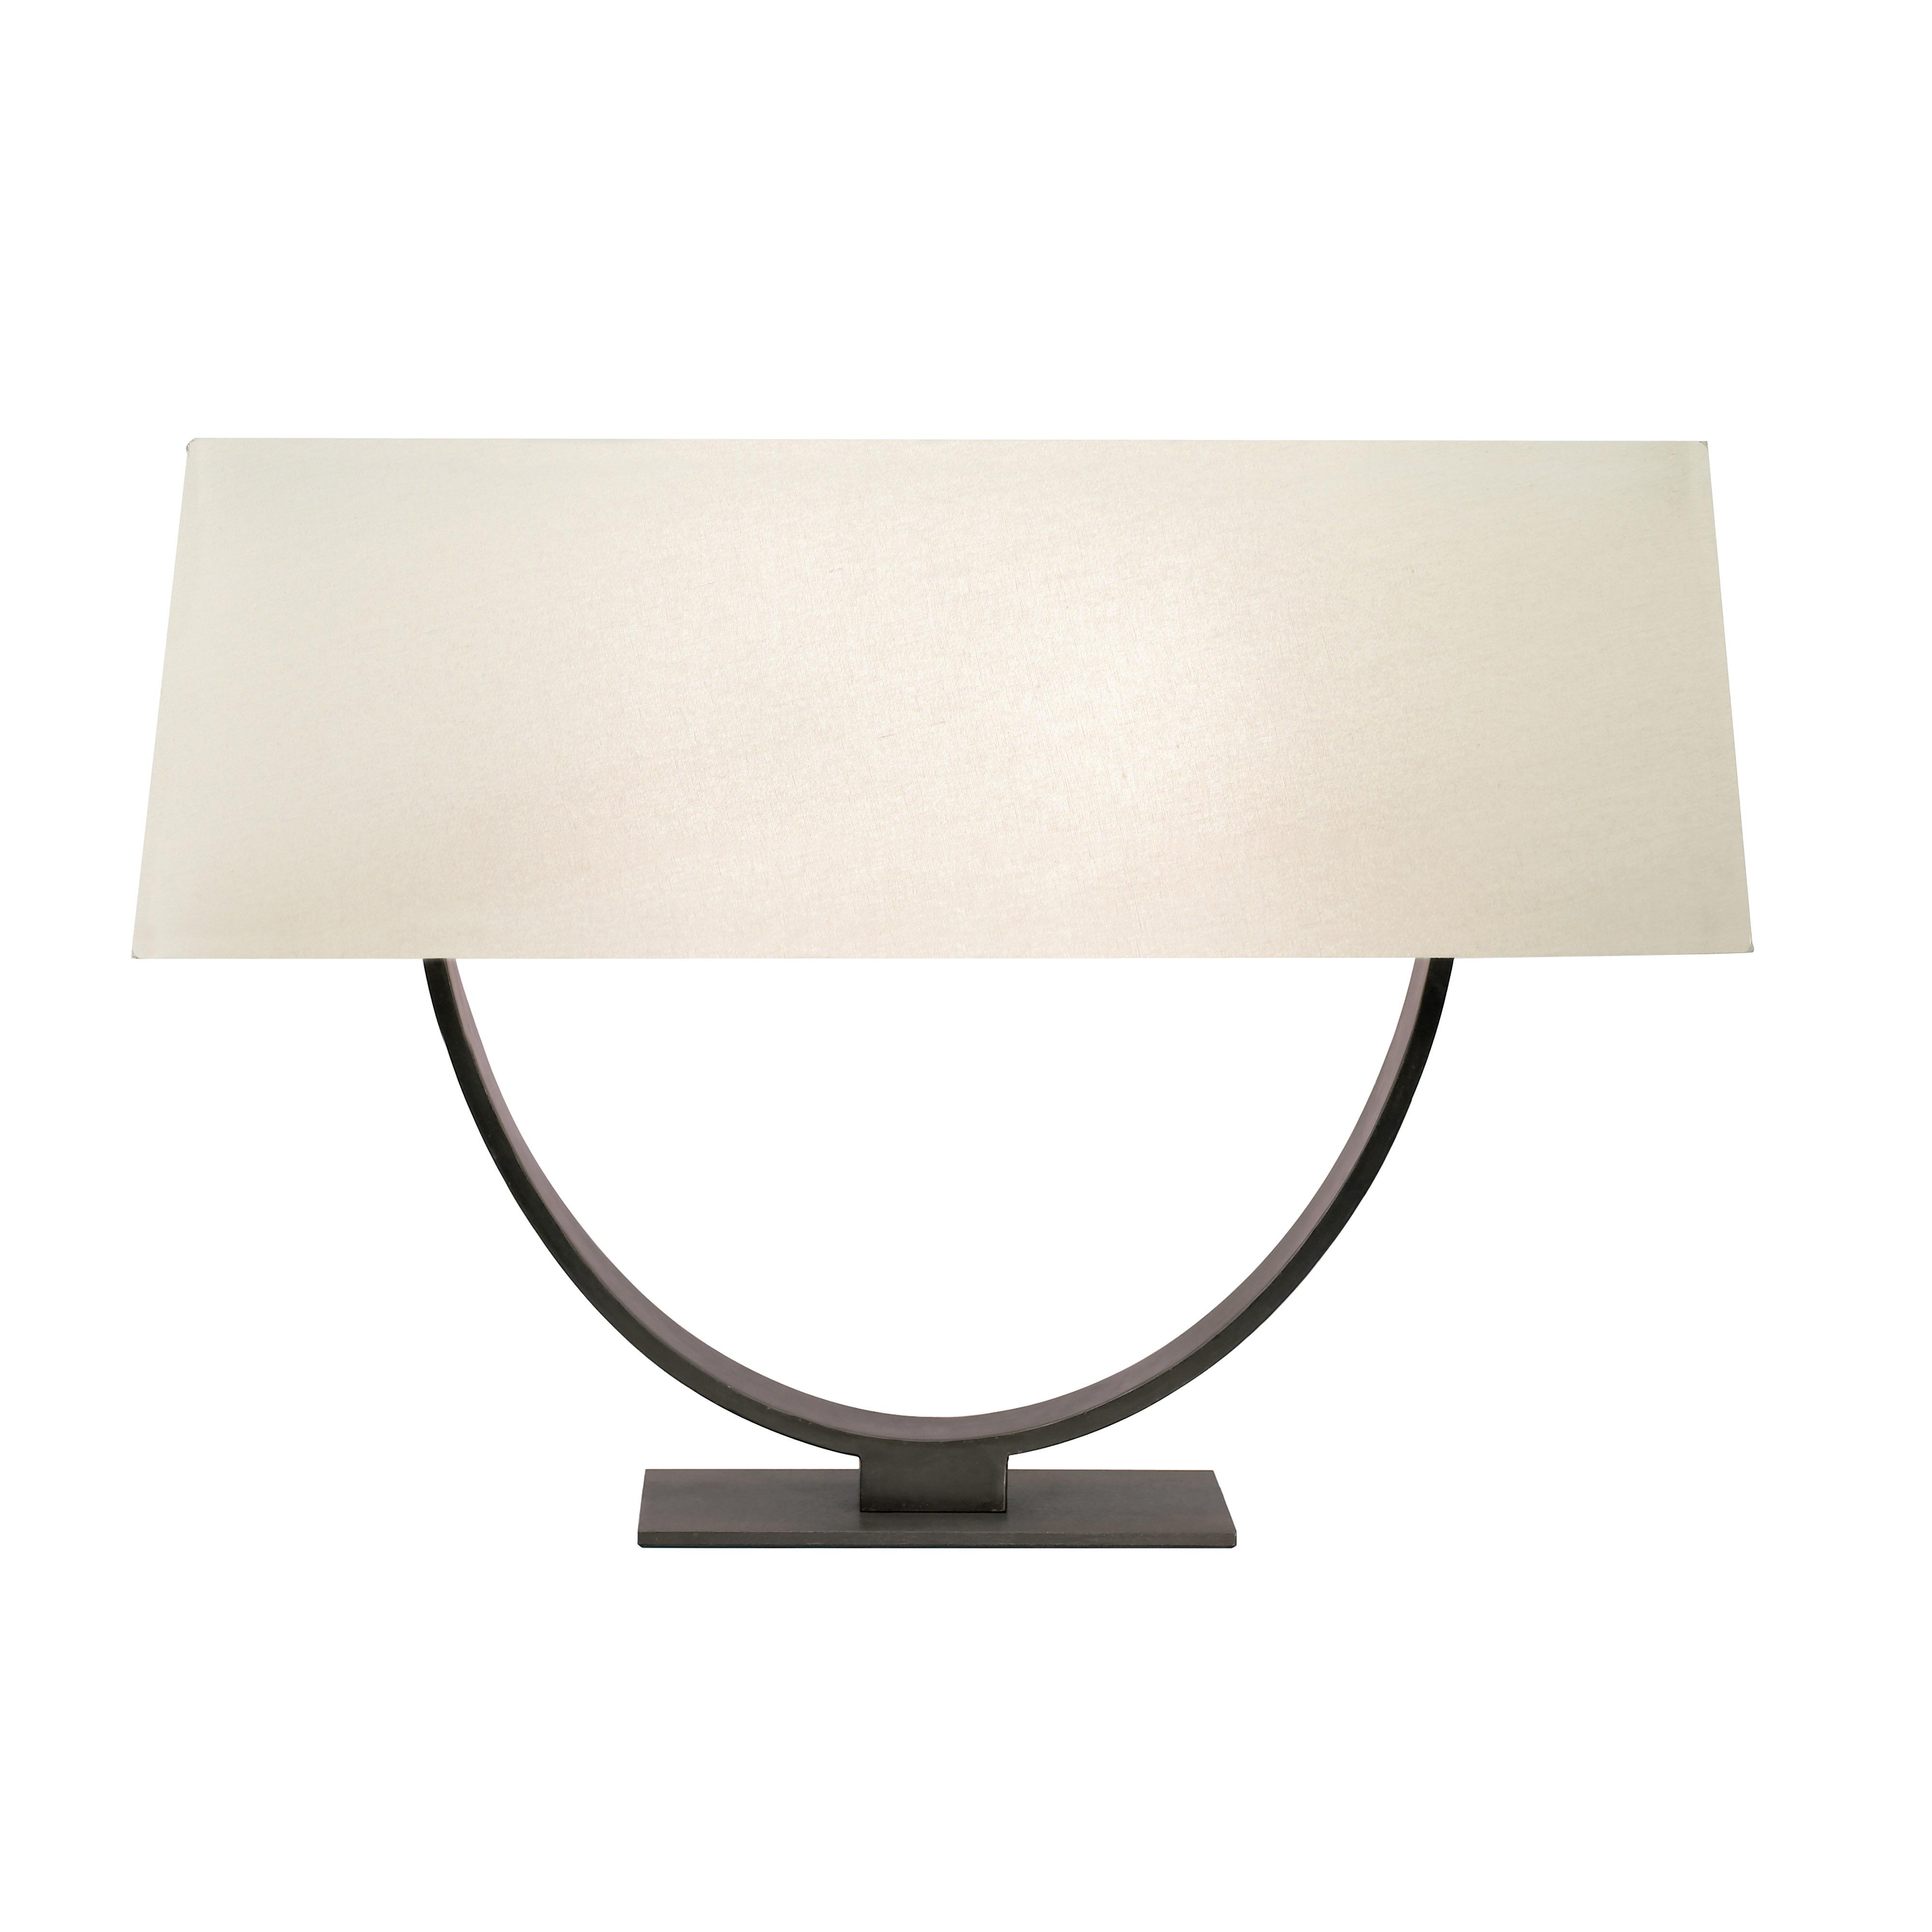 Brava lamp